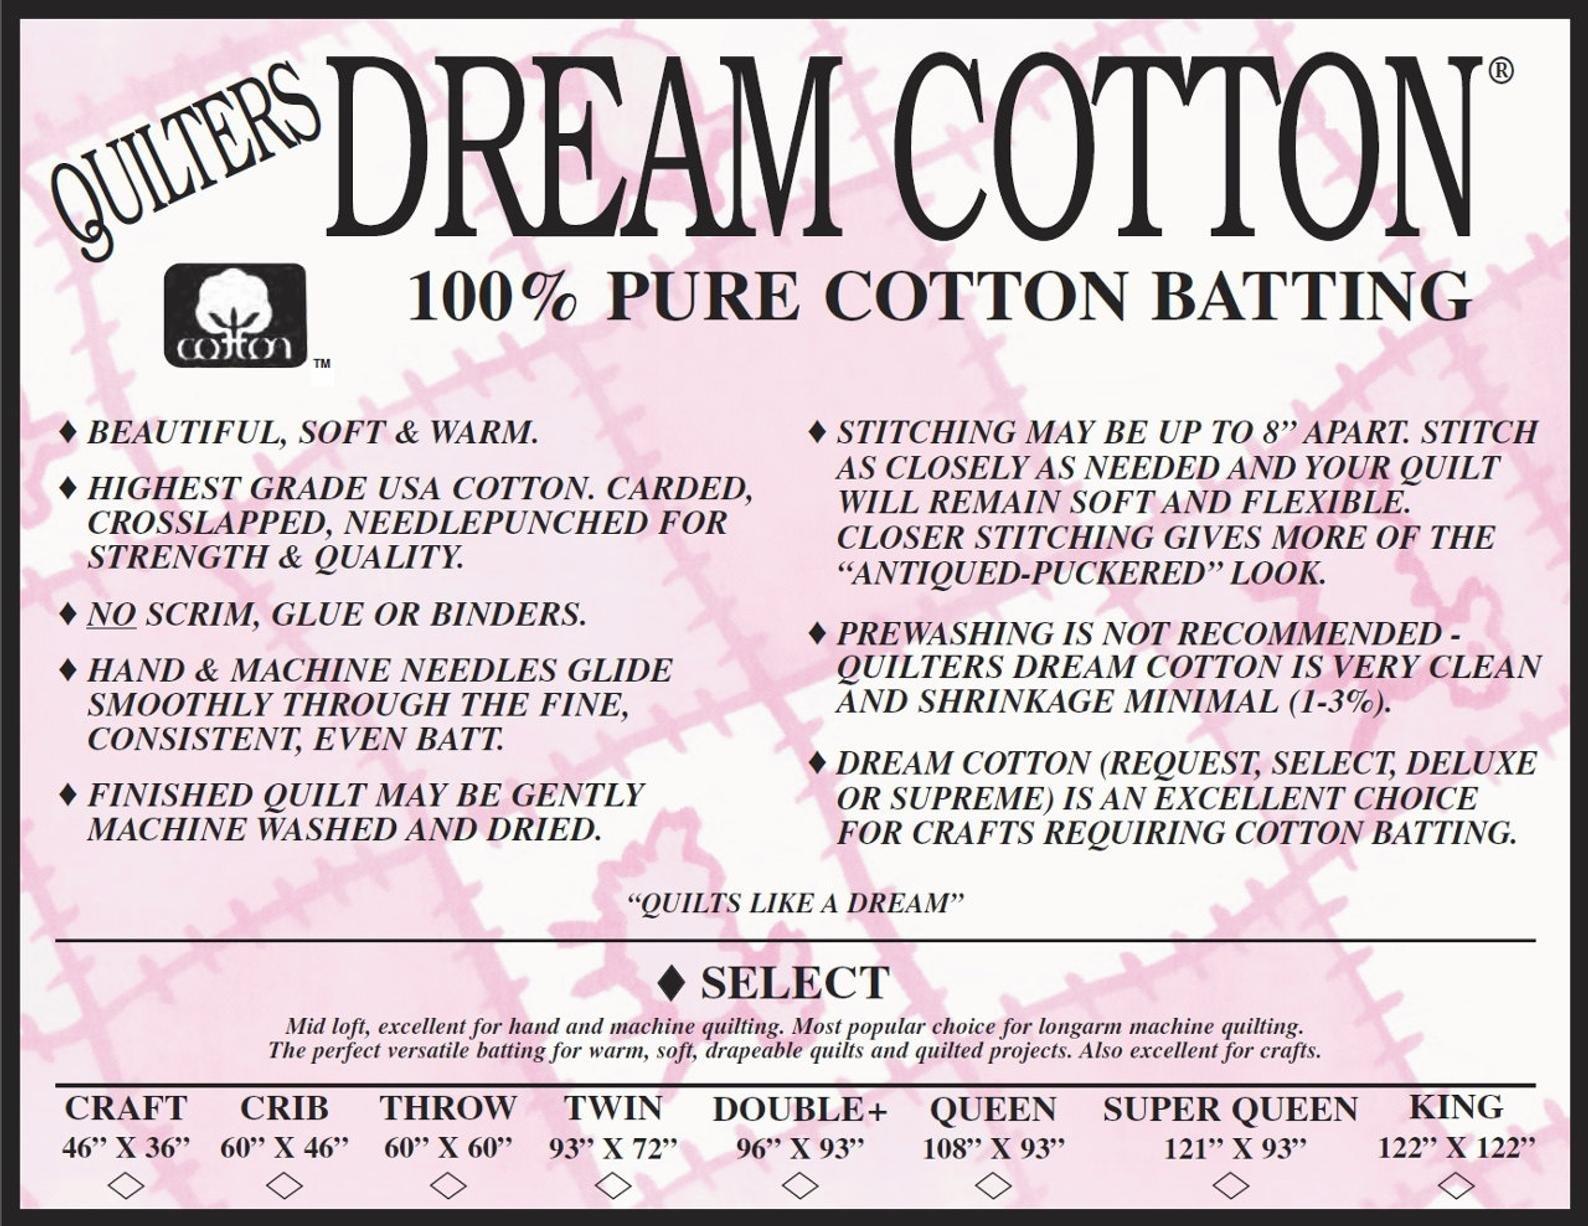 Quilters Dream Cotton Batting - Select Loft - White